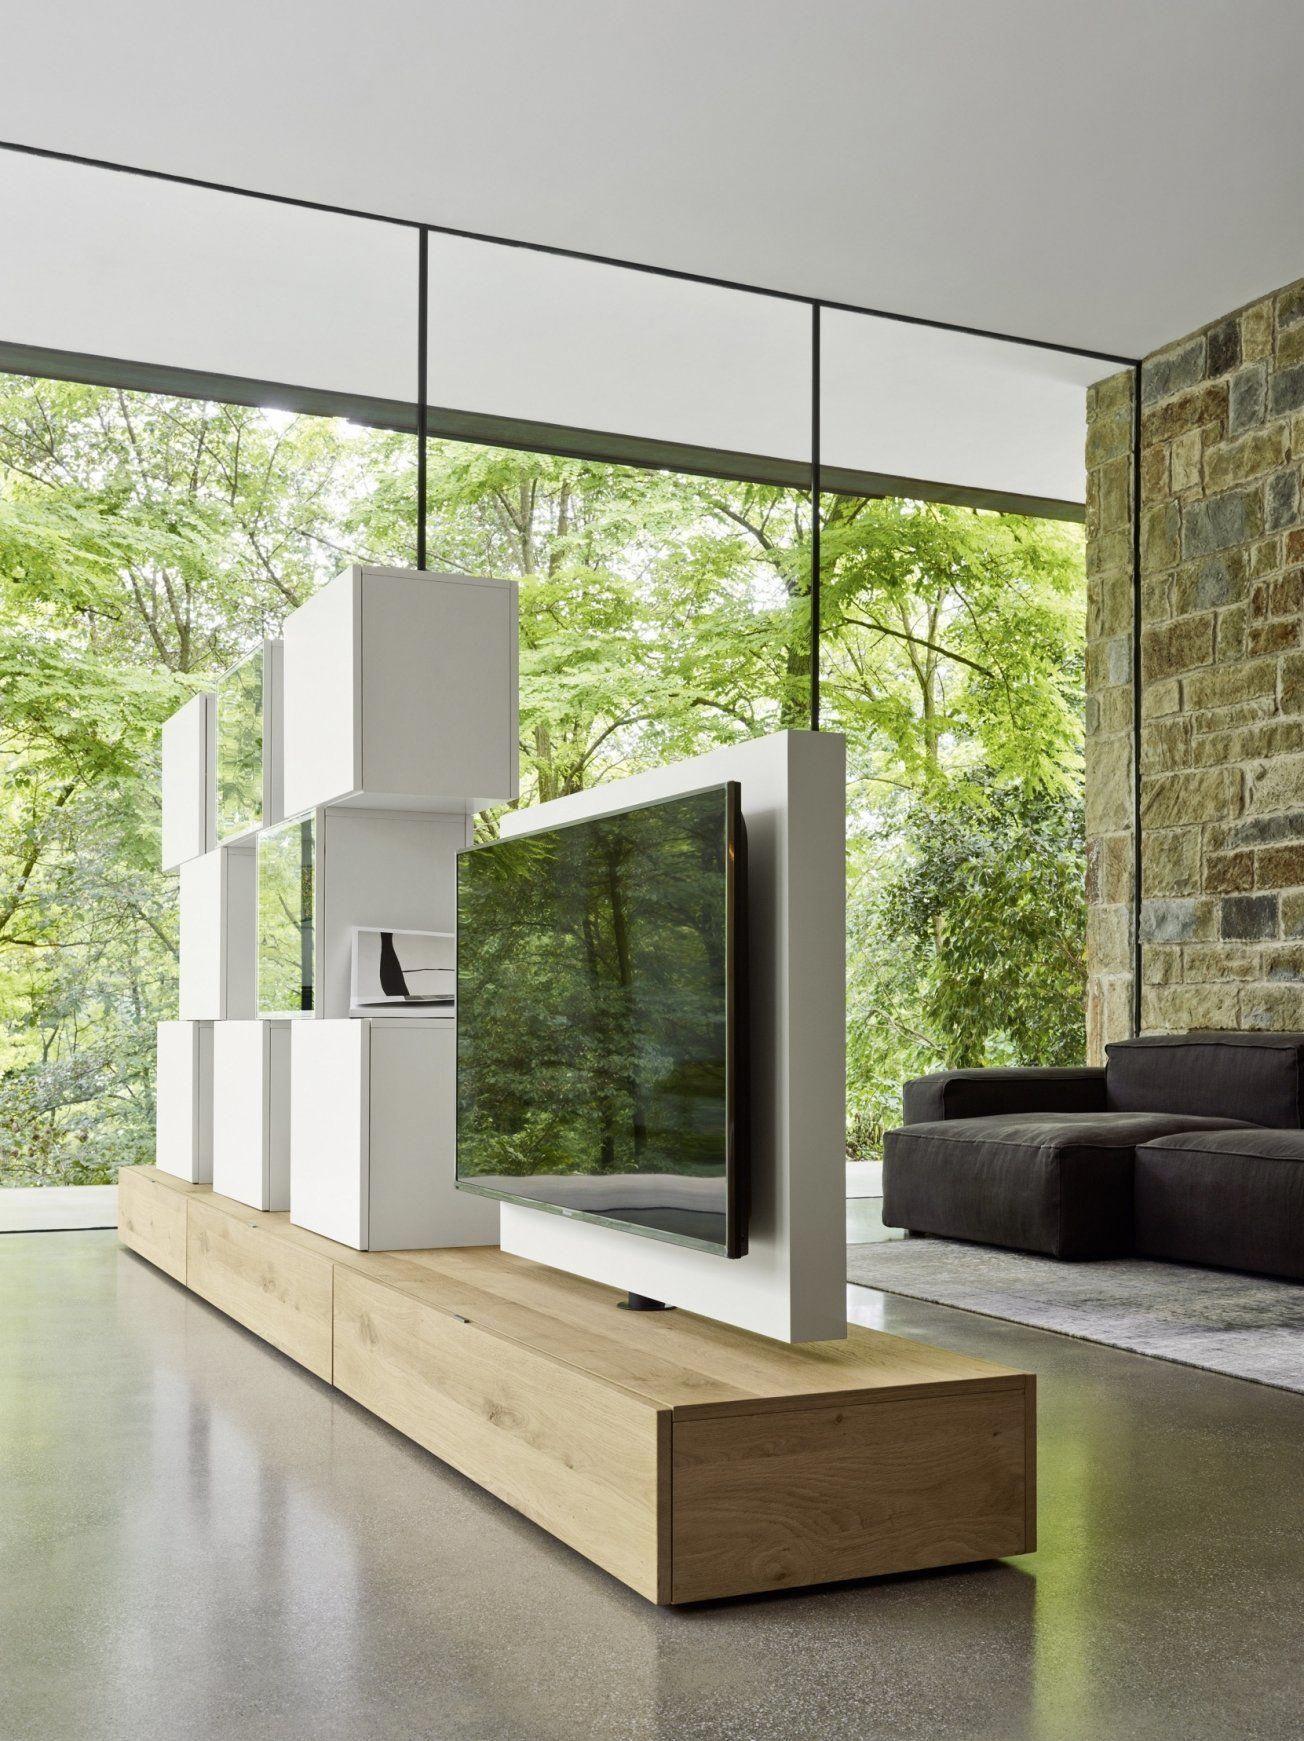 Multimedia Unit By Studio IQ #swiveltvstand